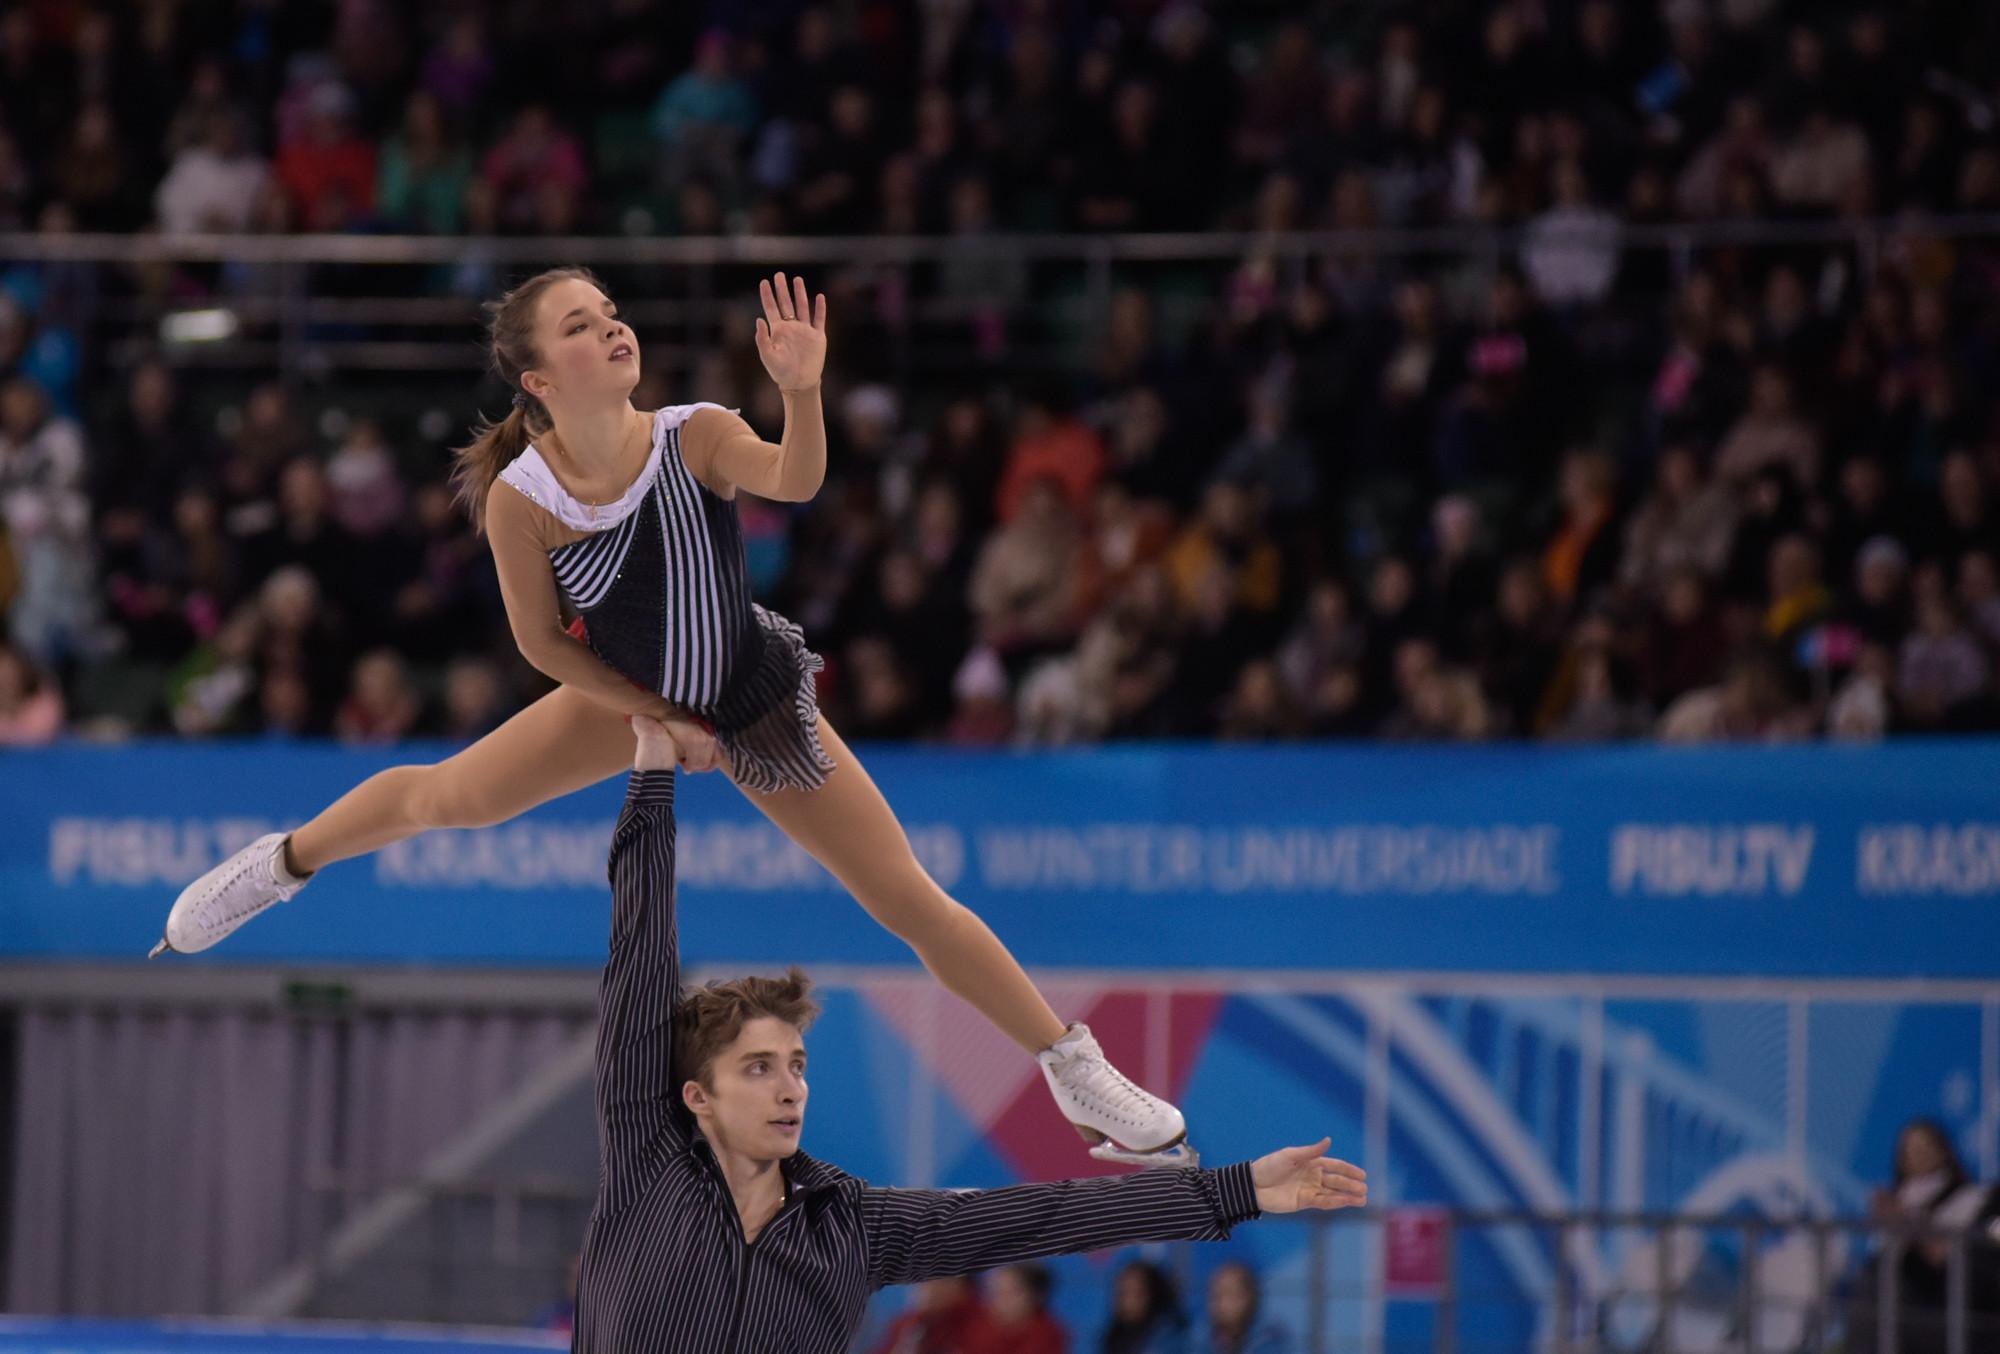 Russia's Alisa Efimova and Alexander Korovin won the pairs final of the Krasnoyarsk 2019 Winter Universiade ©Krasnoyarsk 2019